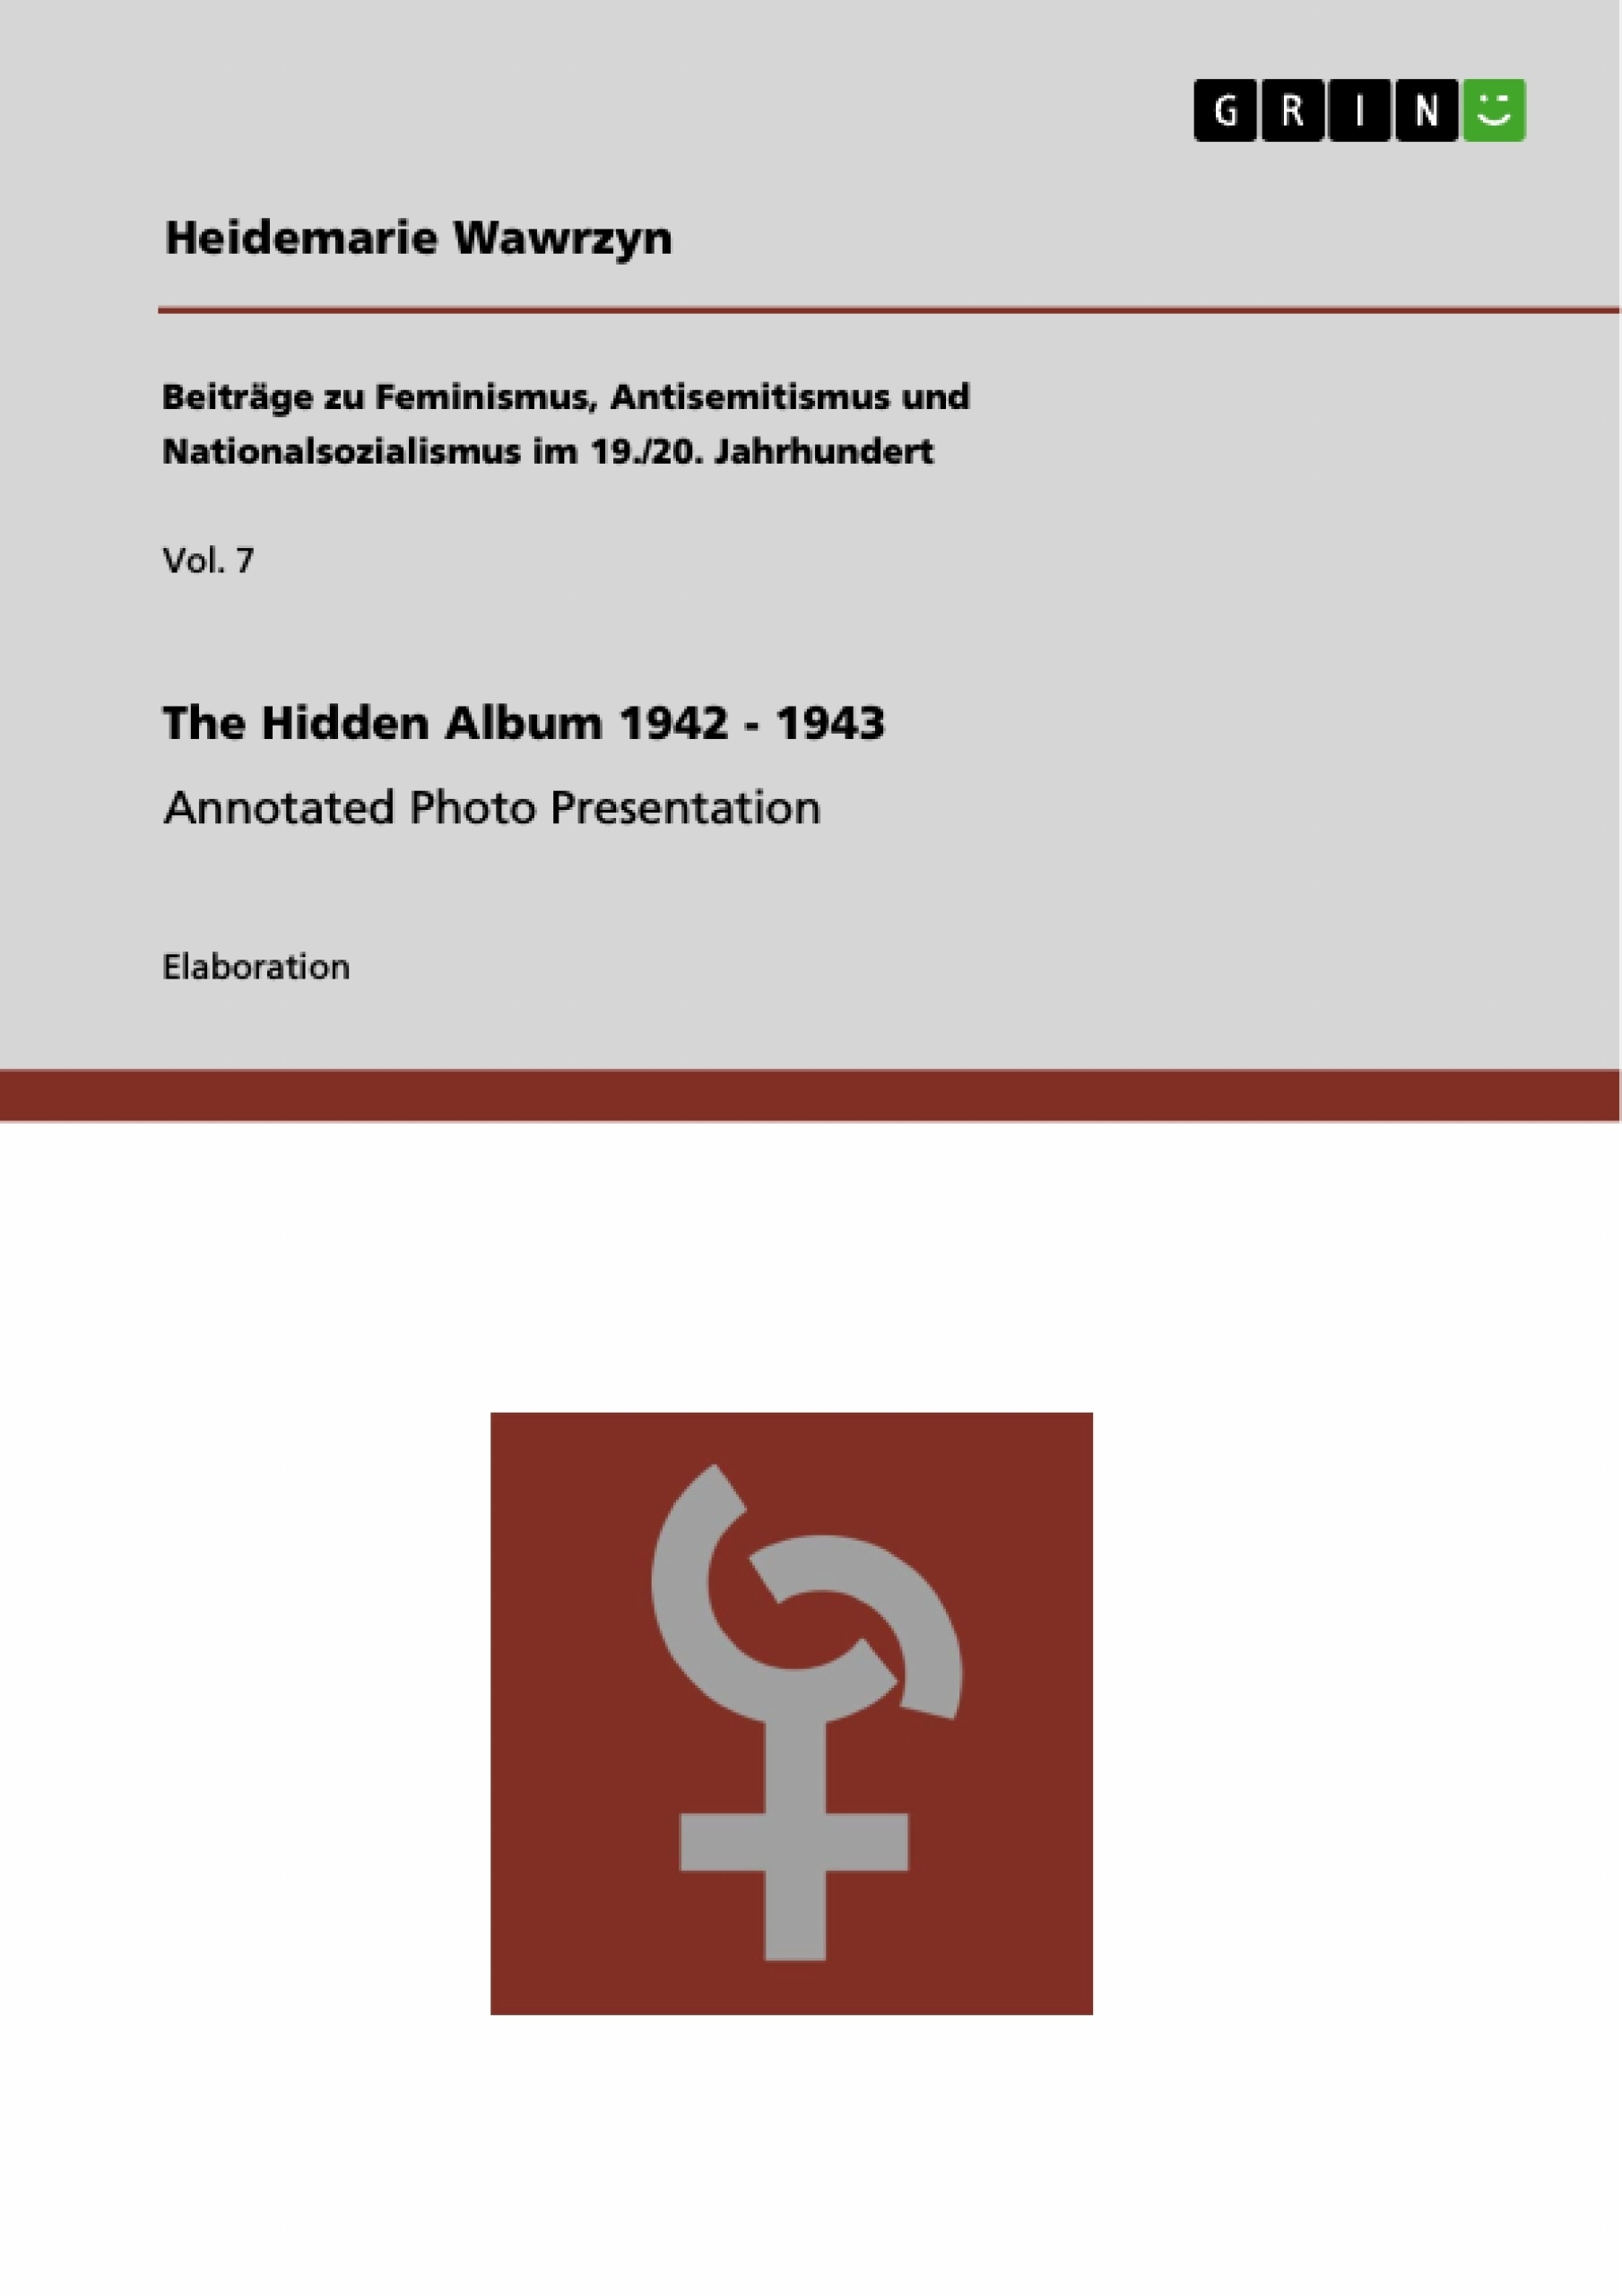 Title: The Hidden Album 1942 - 1943